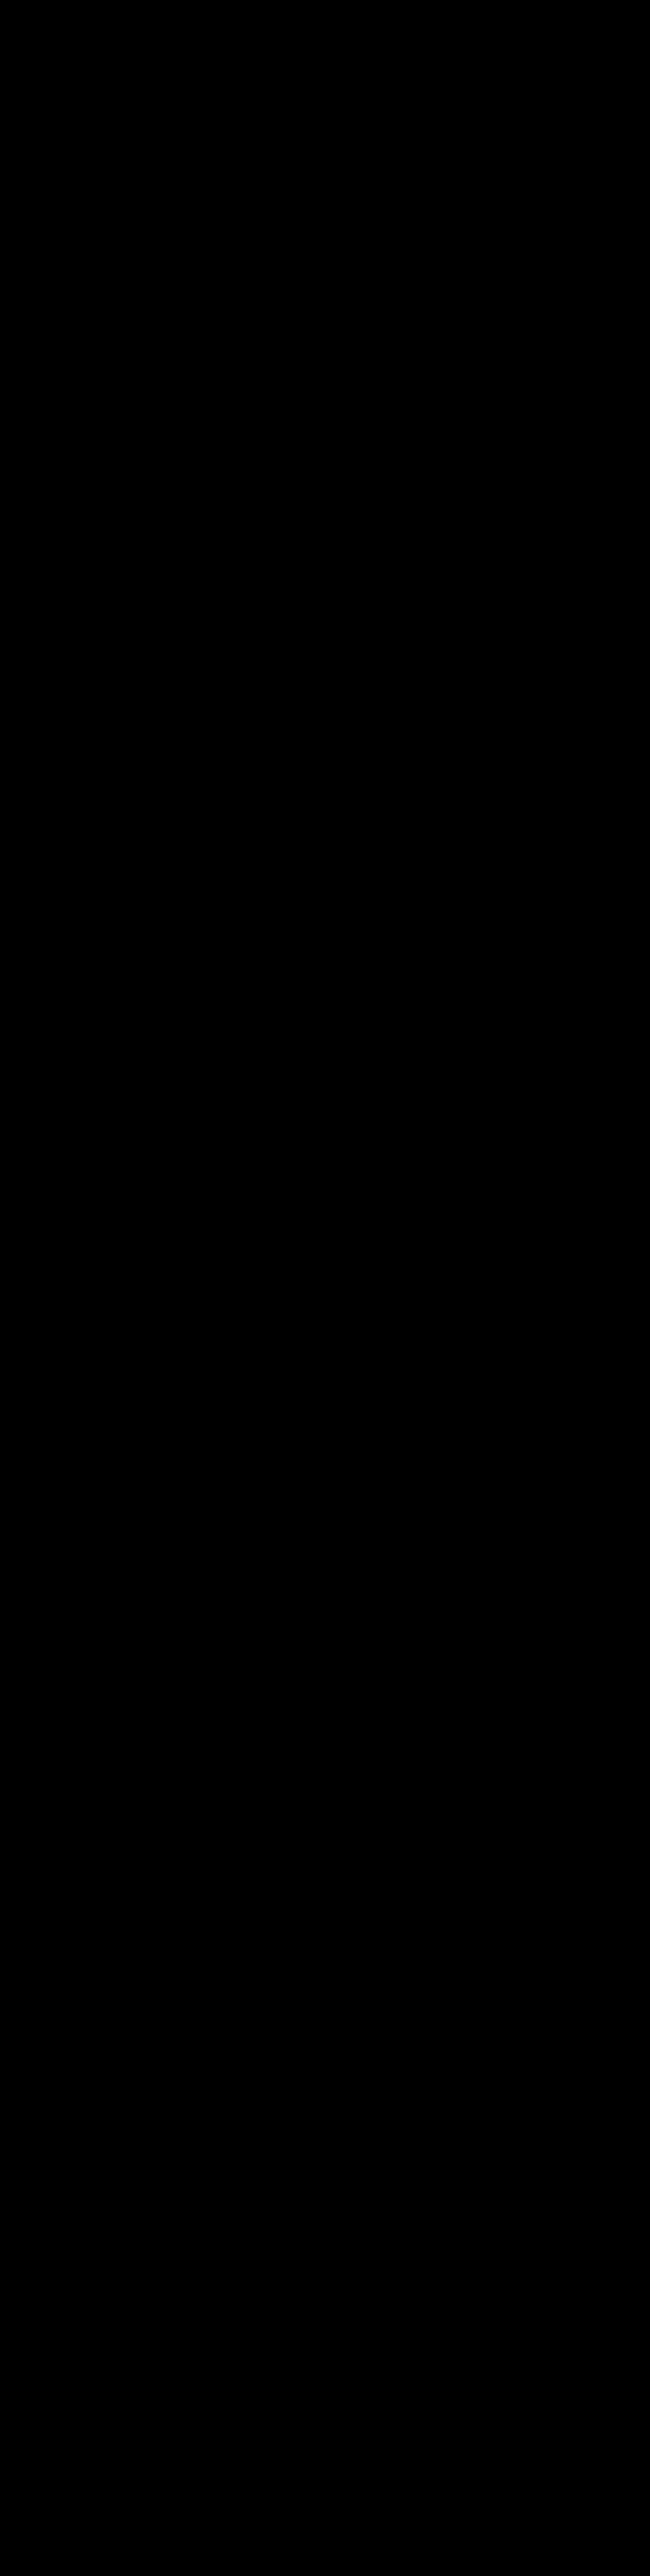 File brackets wikimedia commons. Braces clipart svg